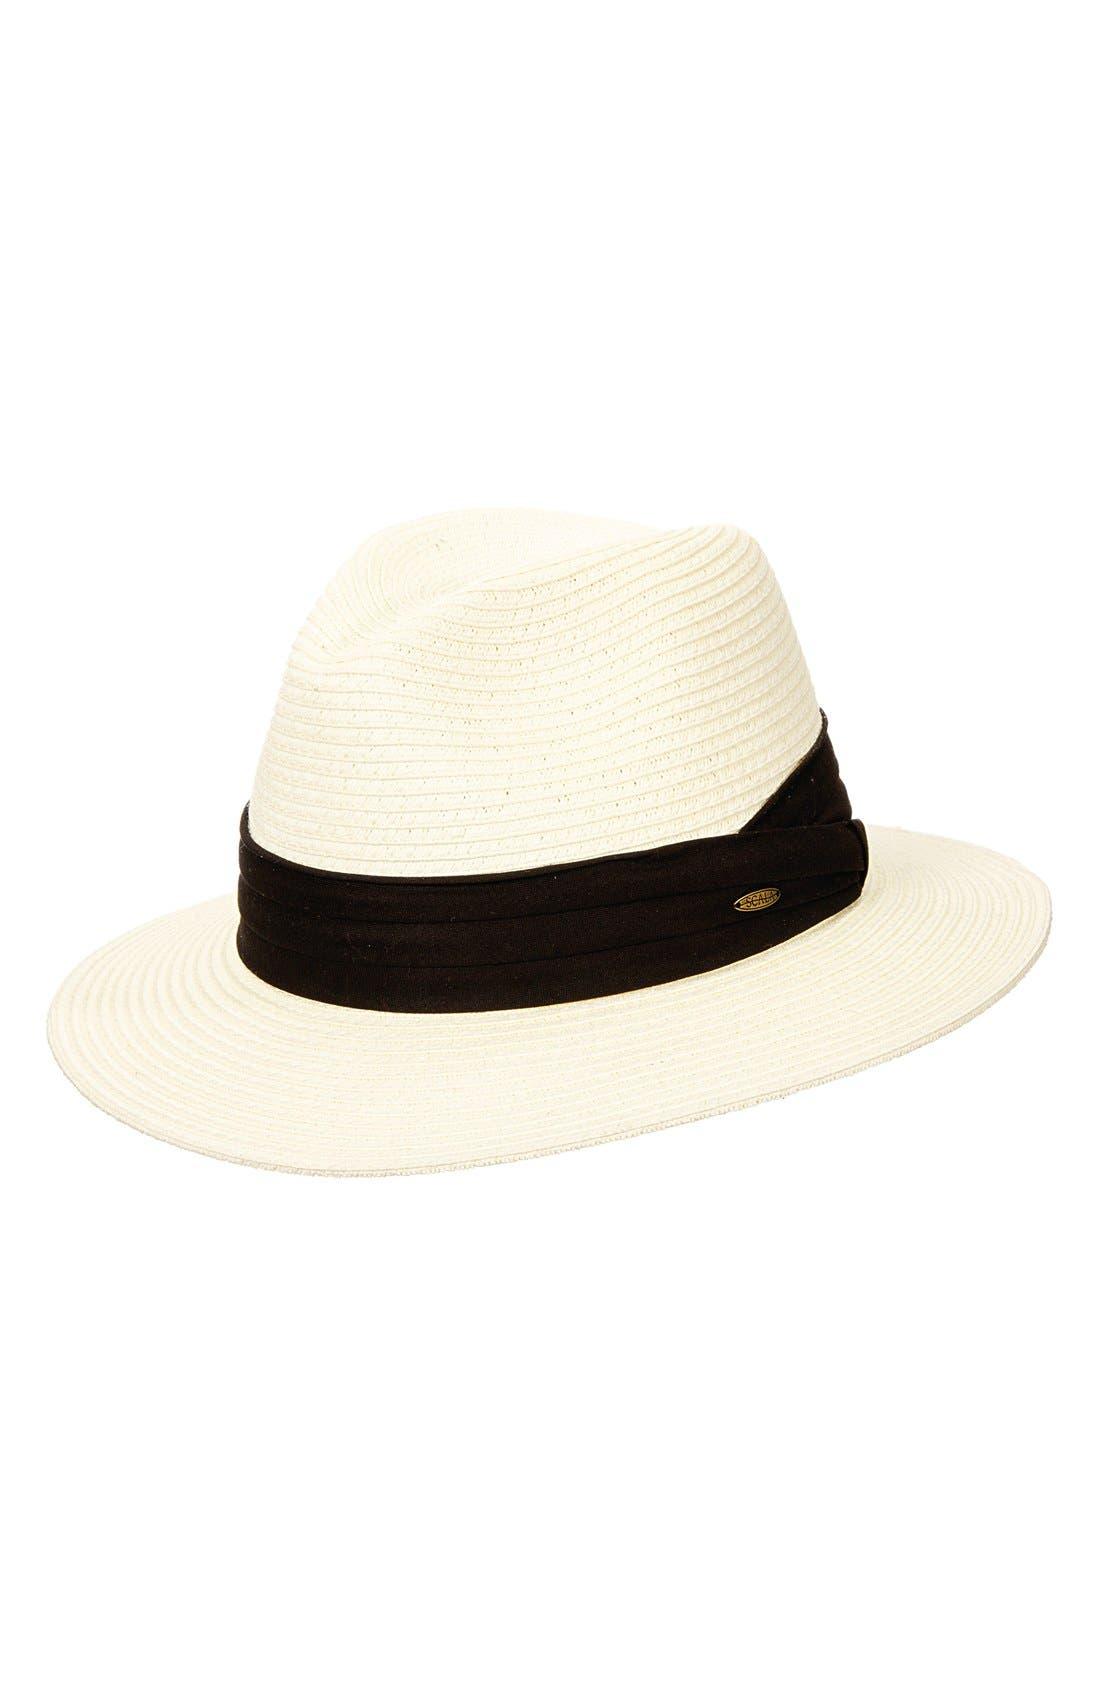 SCALA, Safari Hat, Main thumbnail 1, color, IVORY